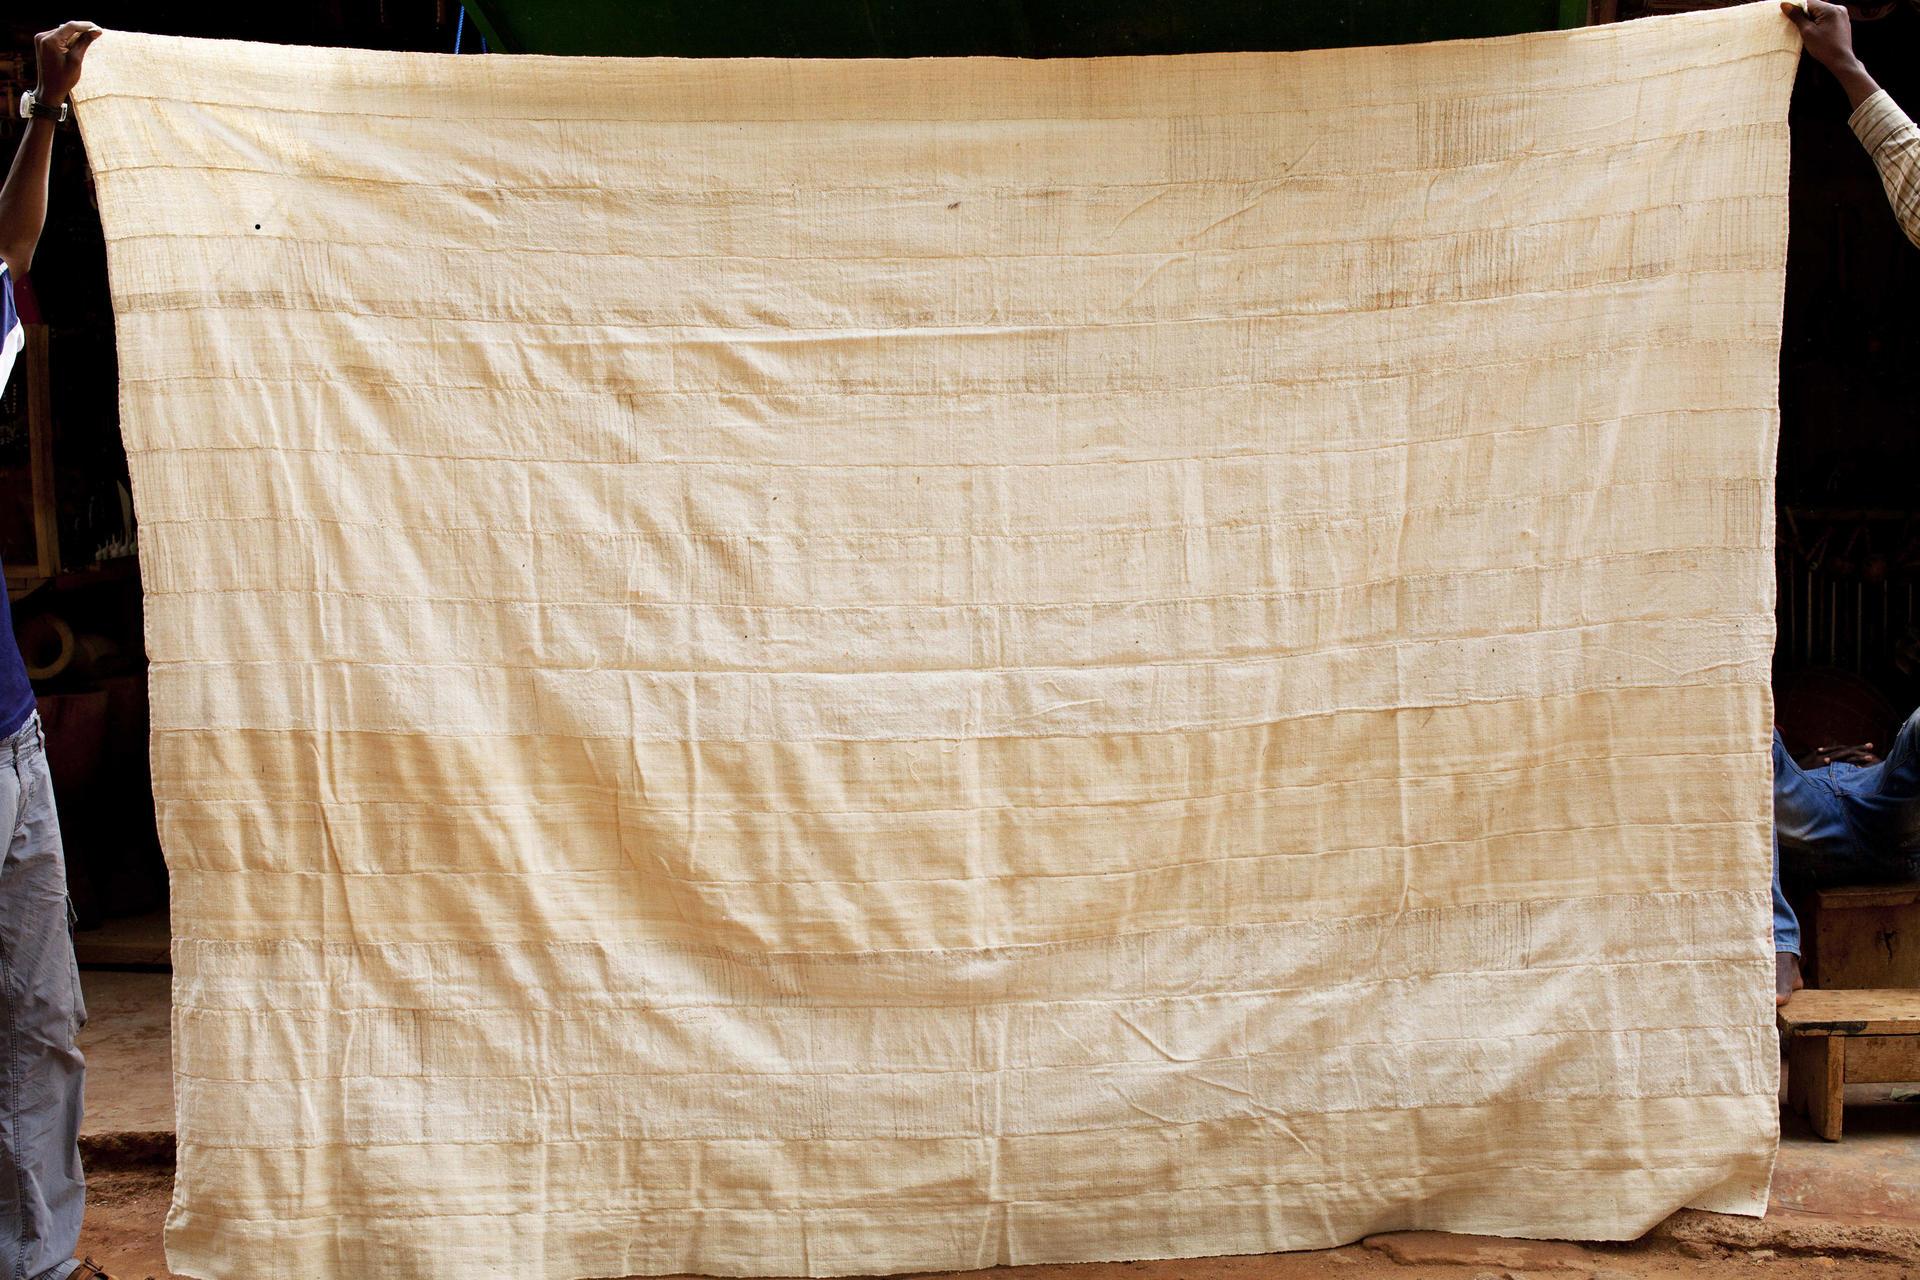 handgewebter bett berwurf aus burkina faso tagesdecke 100 baumwolle gundara. Black Bedroom Furniture Sets. Home Design Ideas